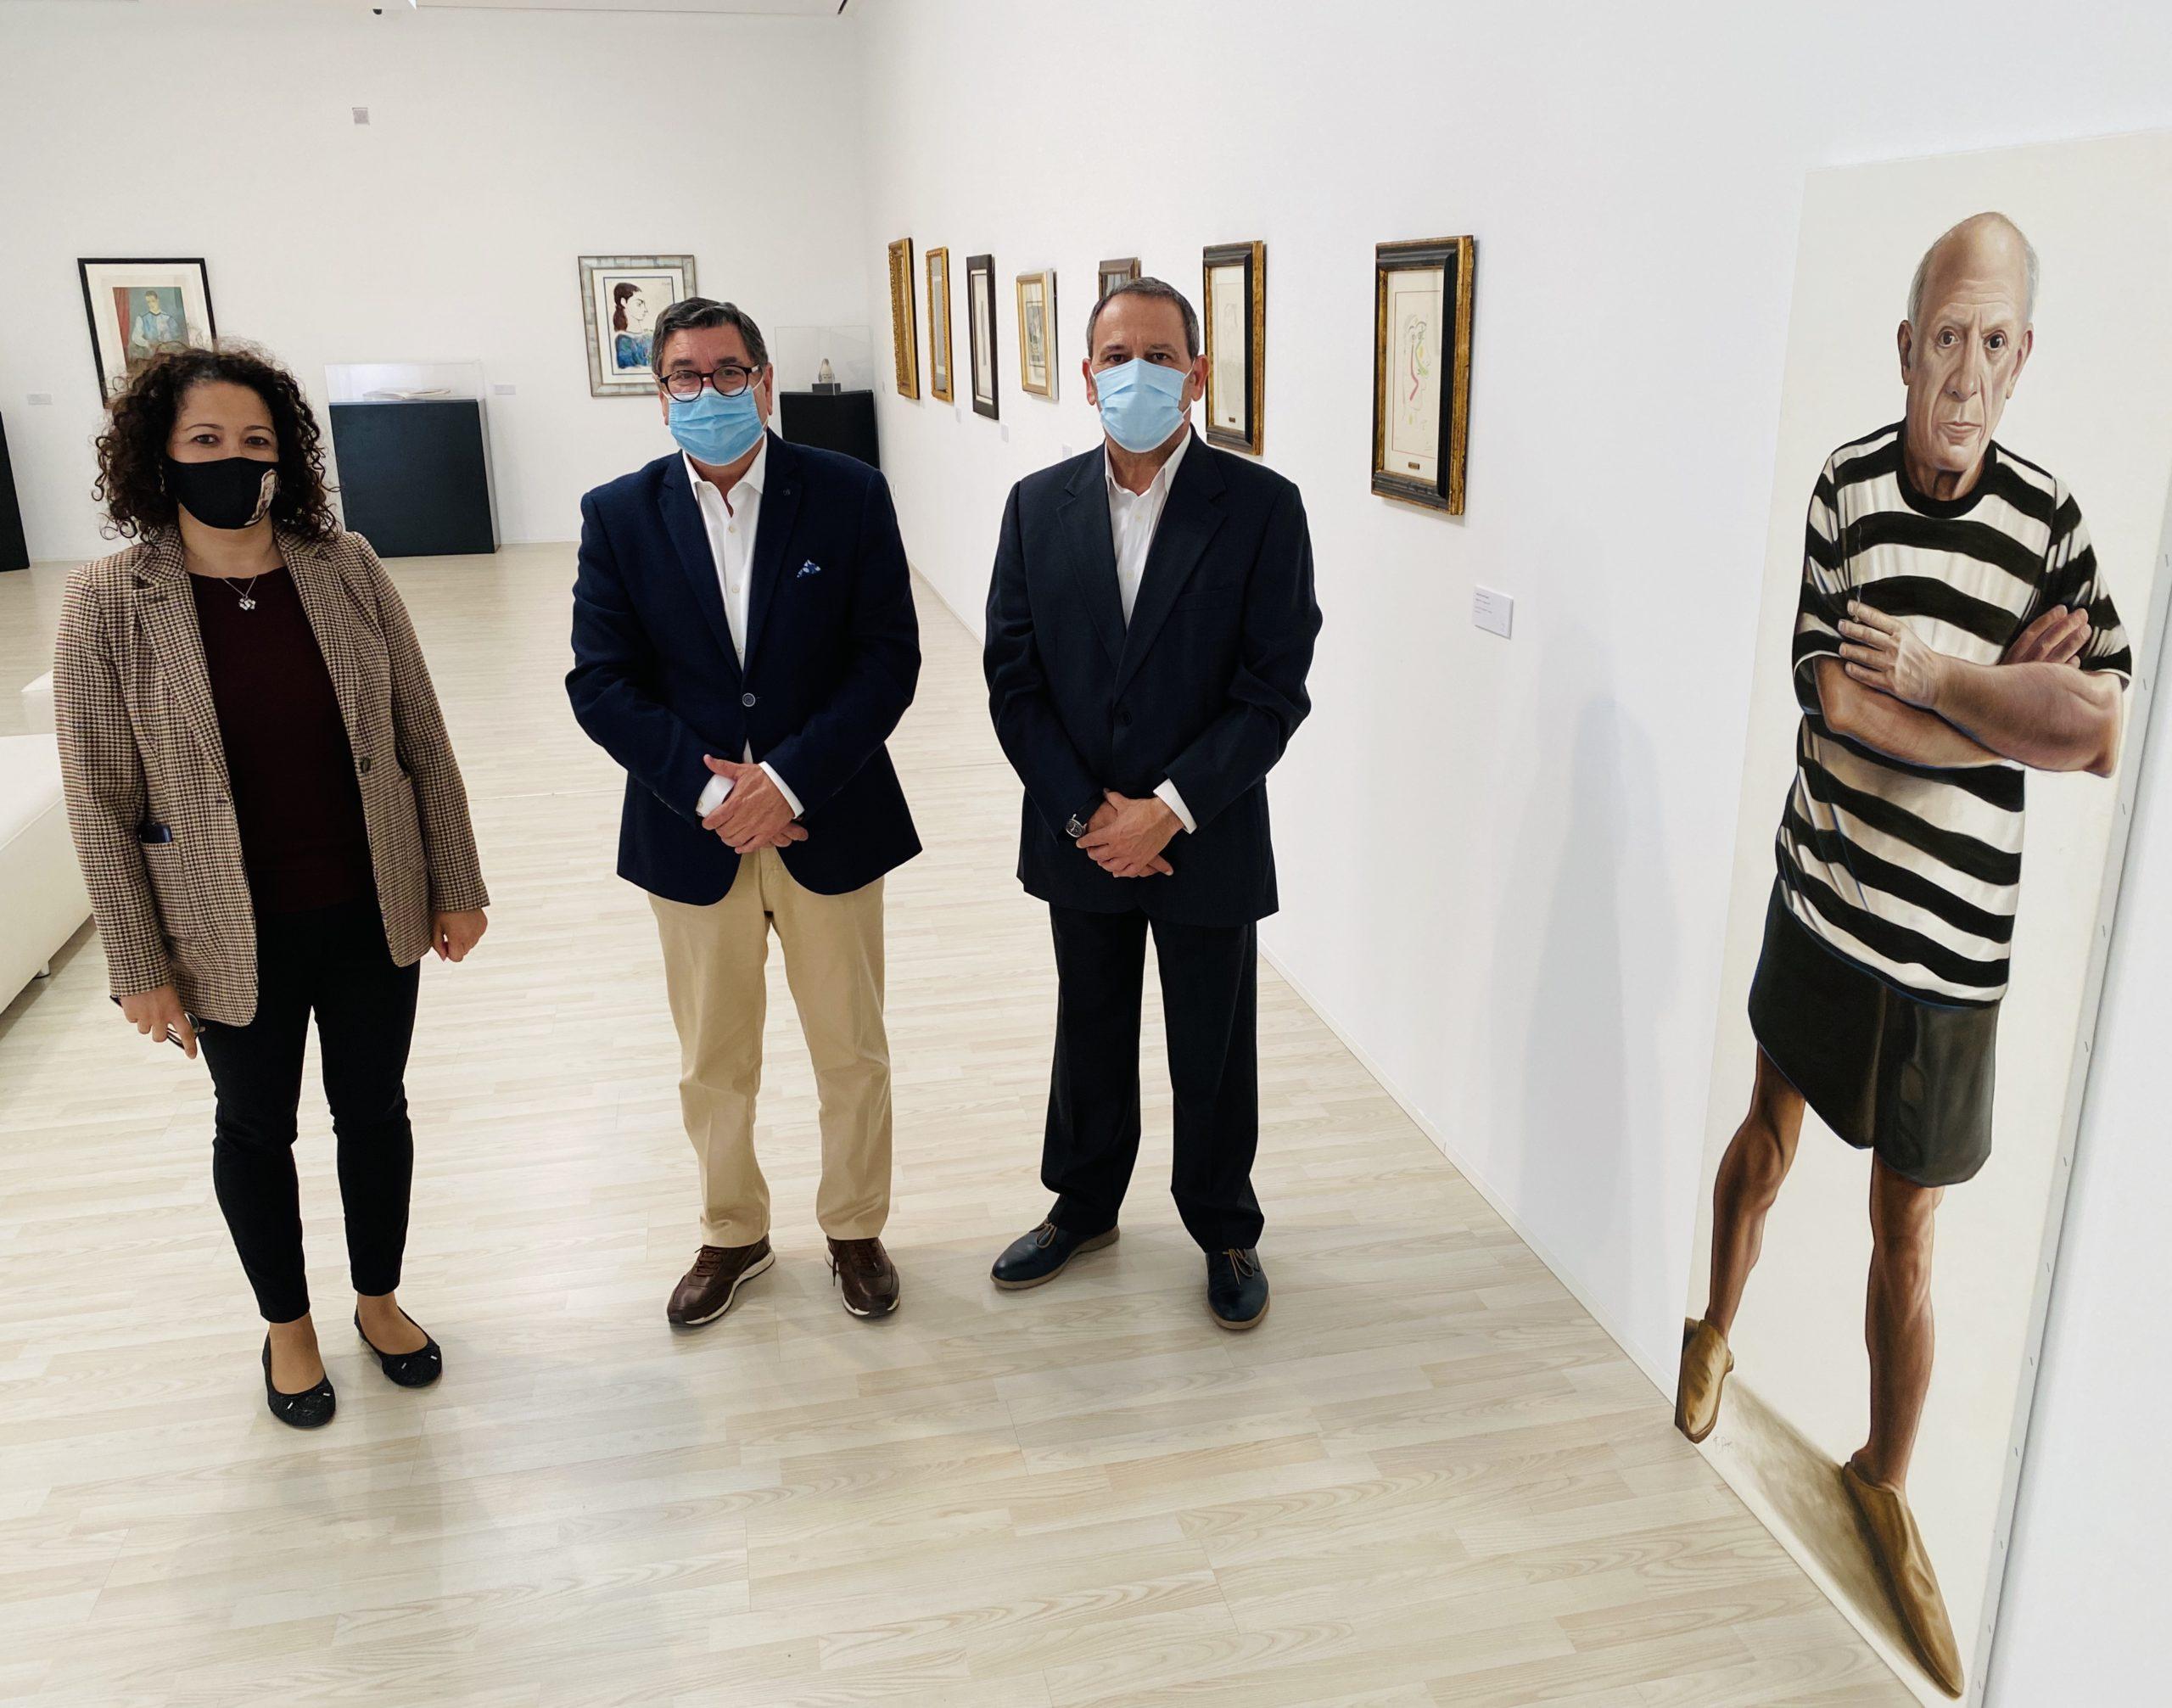 Homenaje a Picasso en el CAC de Vélez-Málaga